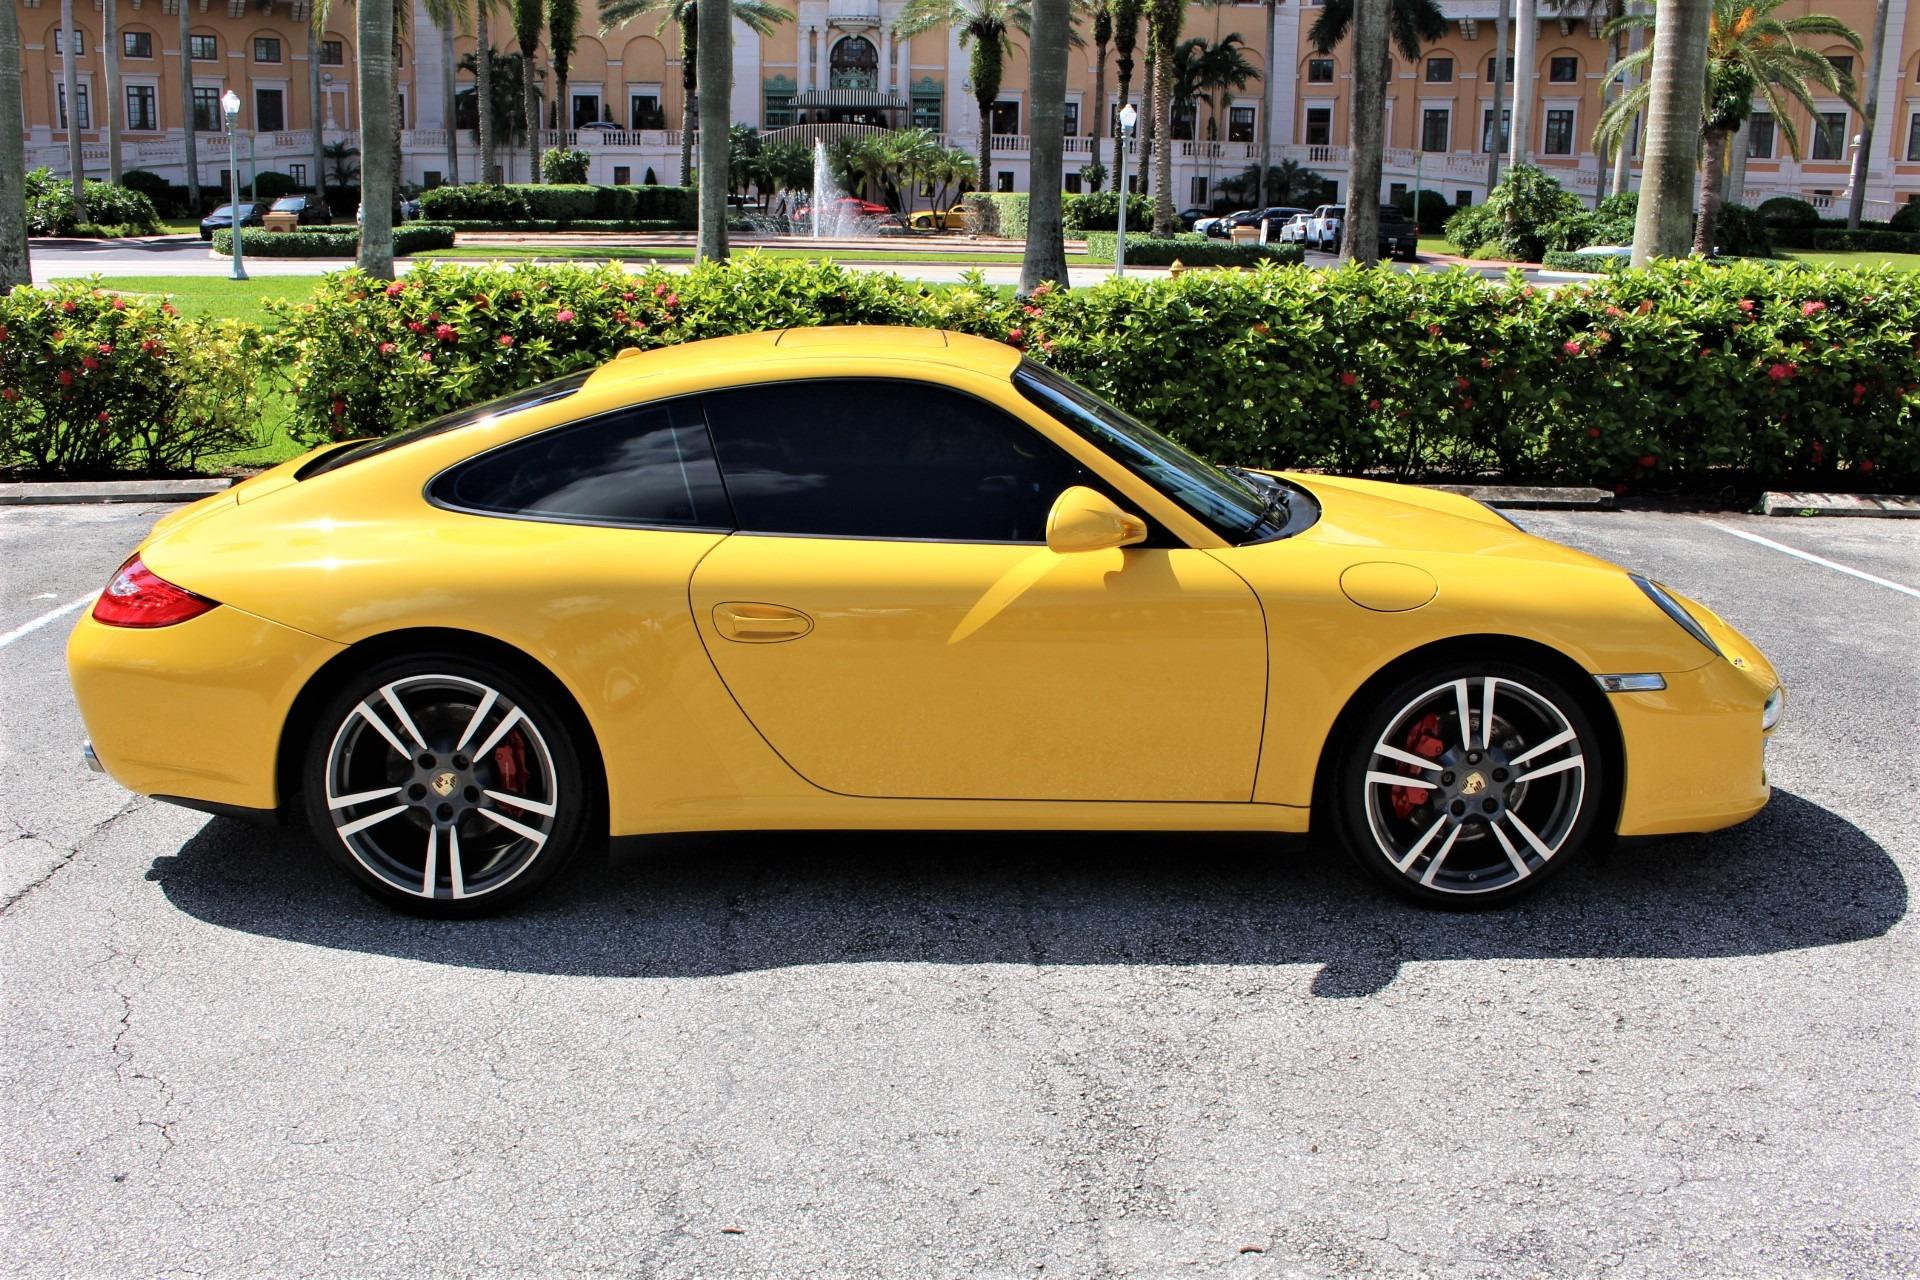 Used 2011 Porsche 911 Carrera 4S for sale $79,850 at The Gables Sports Cars in Miami FL 33146 1